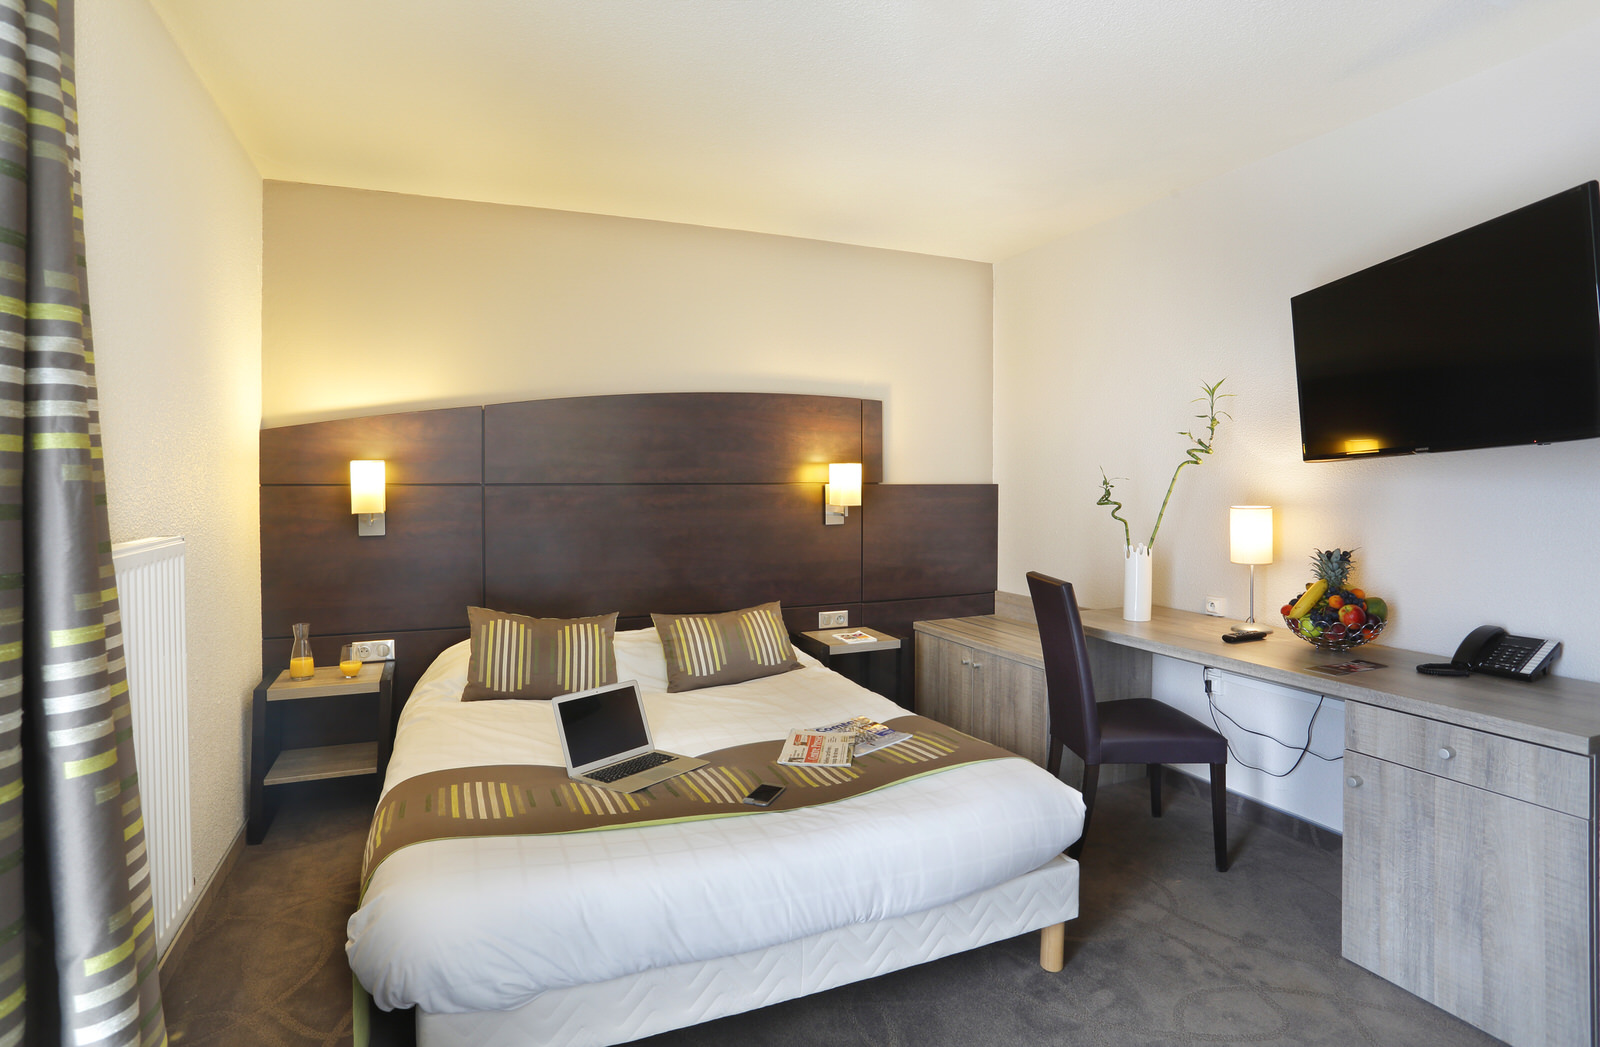 chambres standards h tel arianis. Black Bedroom Furniture Sets. Home Design Ideas